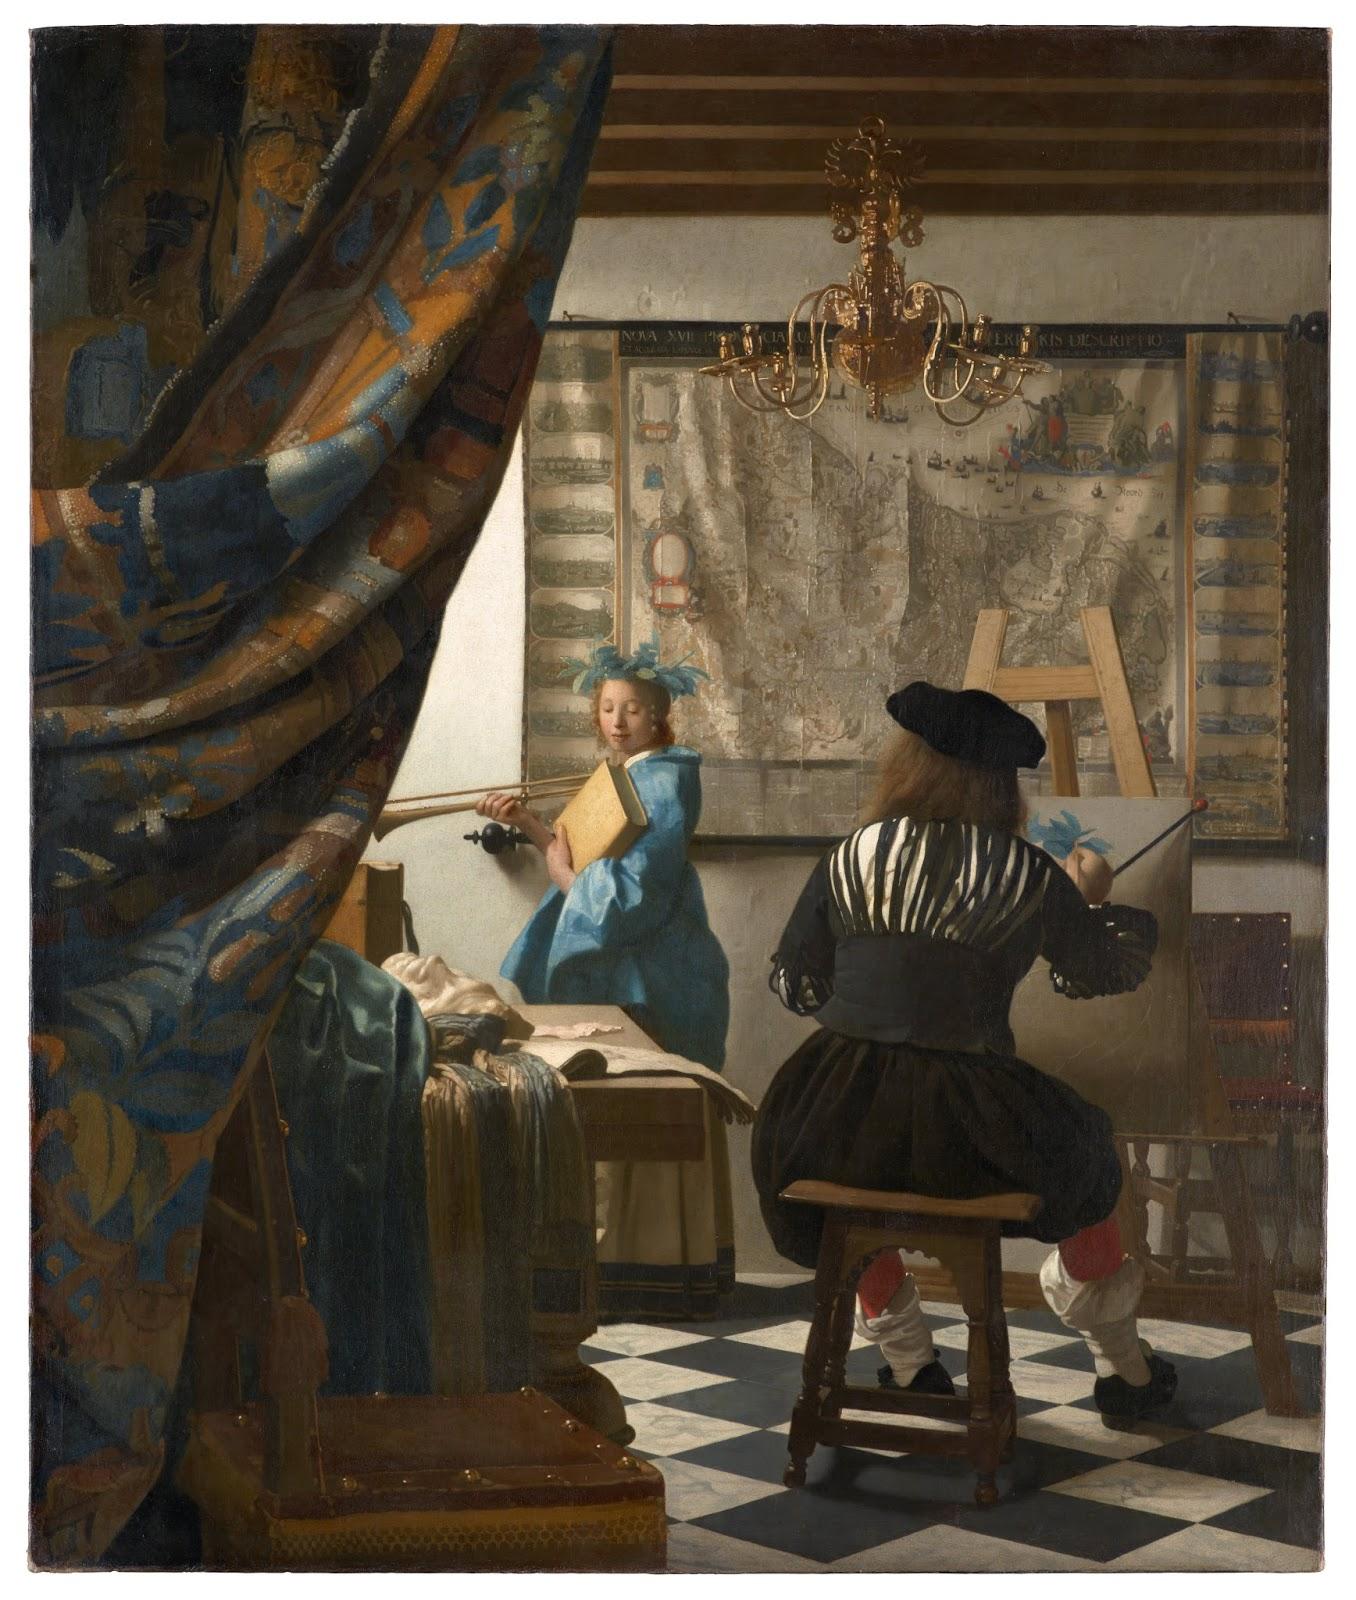 Artist of the Month: Vermeer